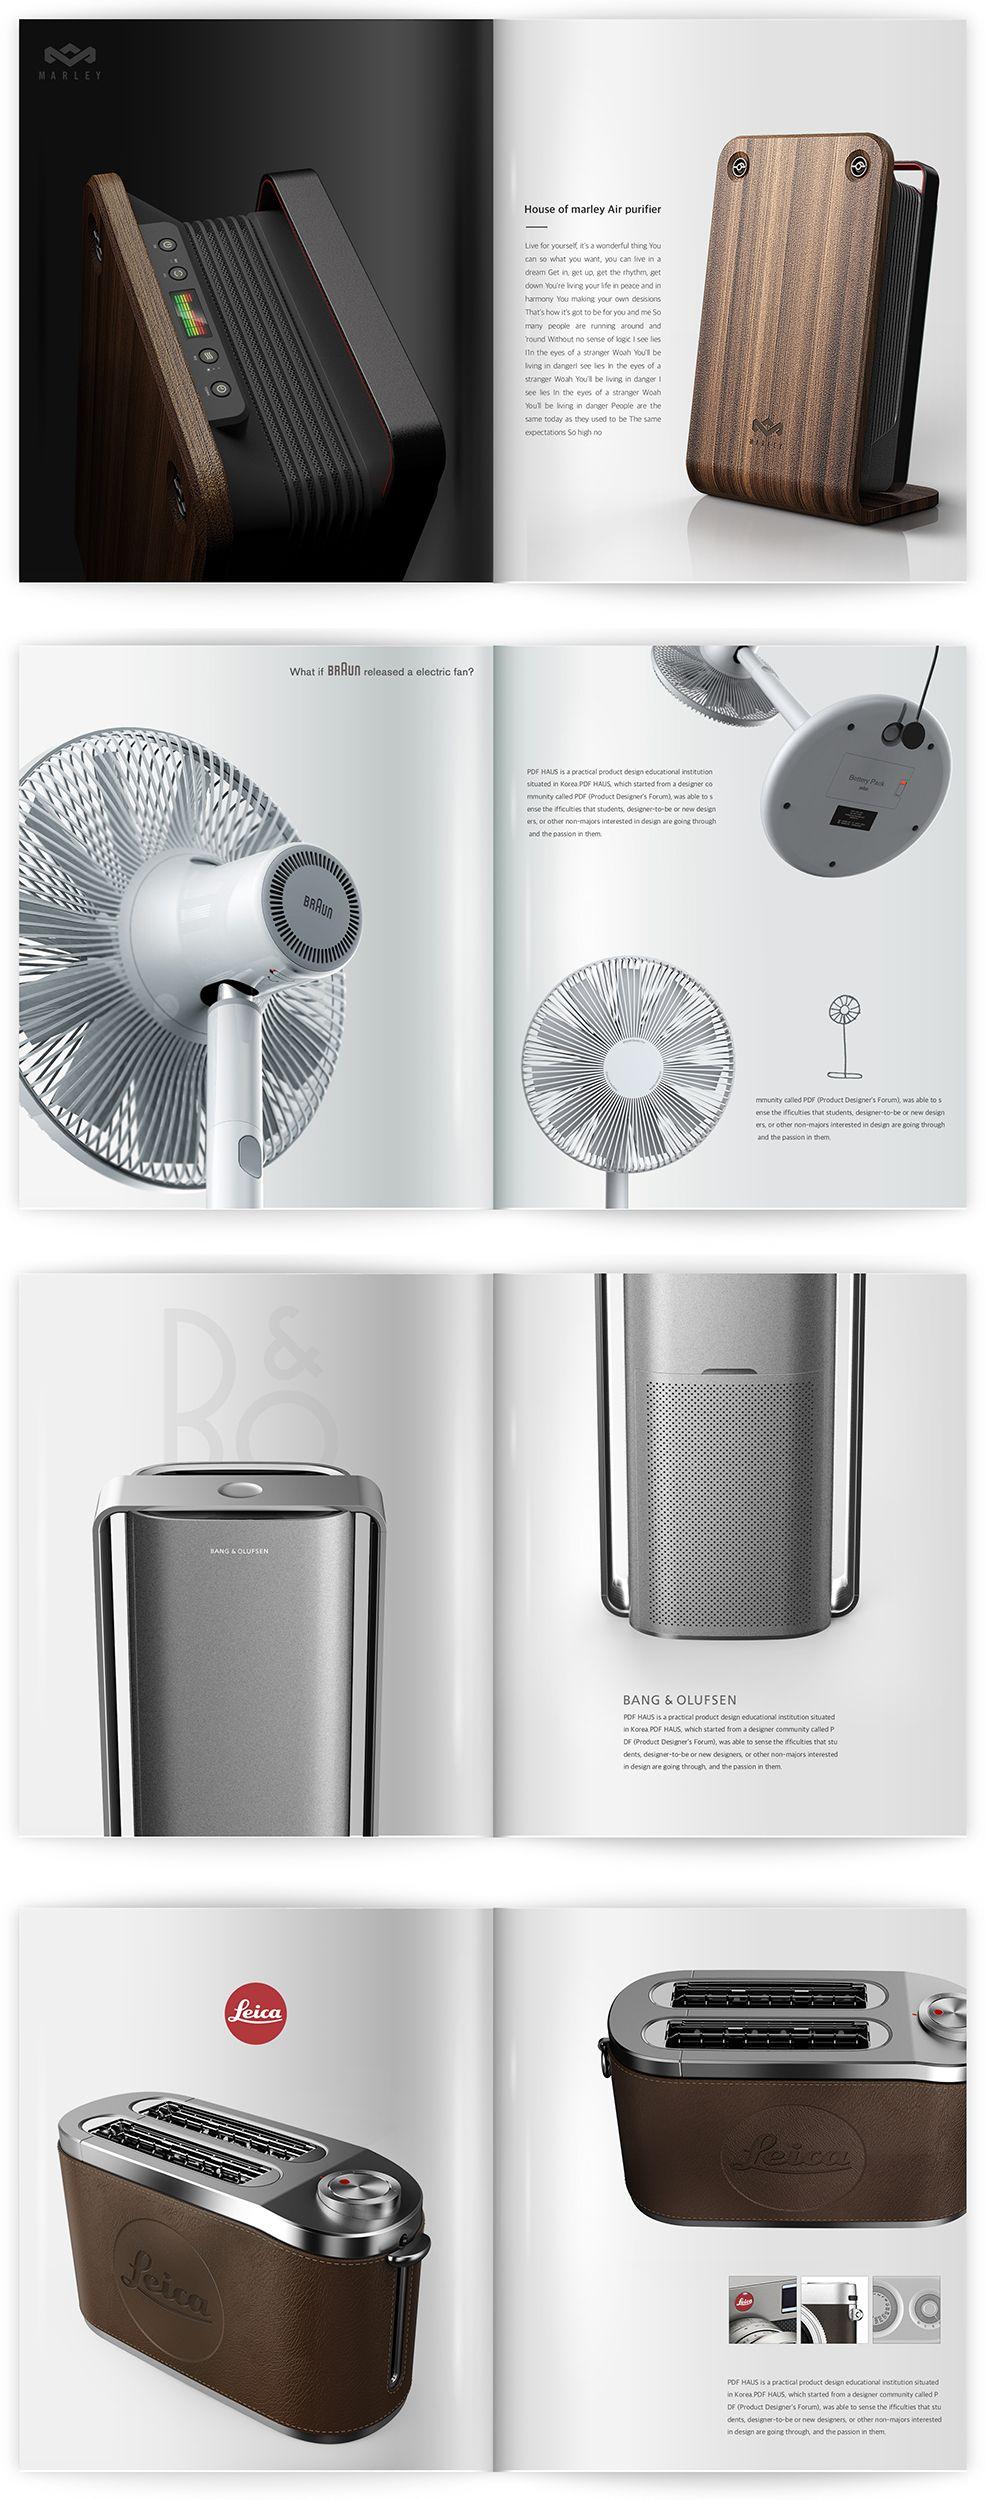 Product design / Industrial design / 제품디자인 / 산업디자인 /Industrial / book / Brochure / Banner /design / #productiondesign